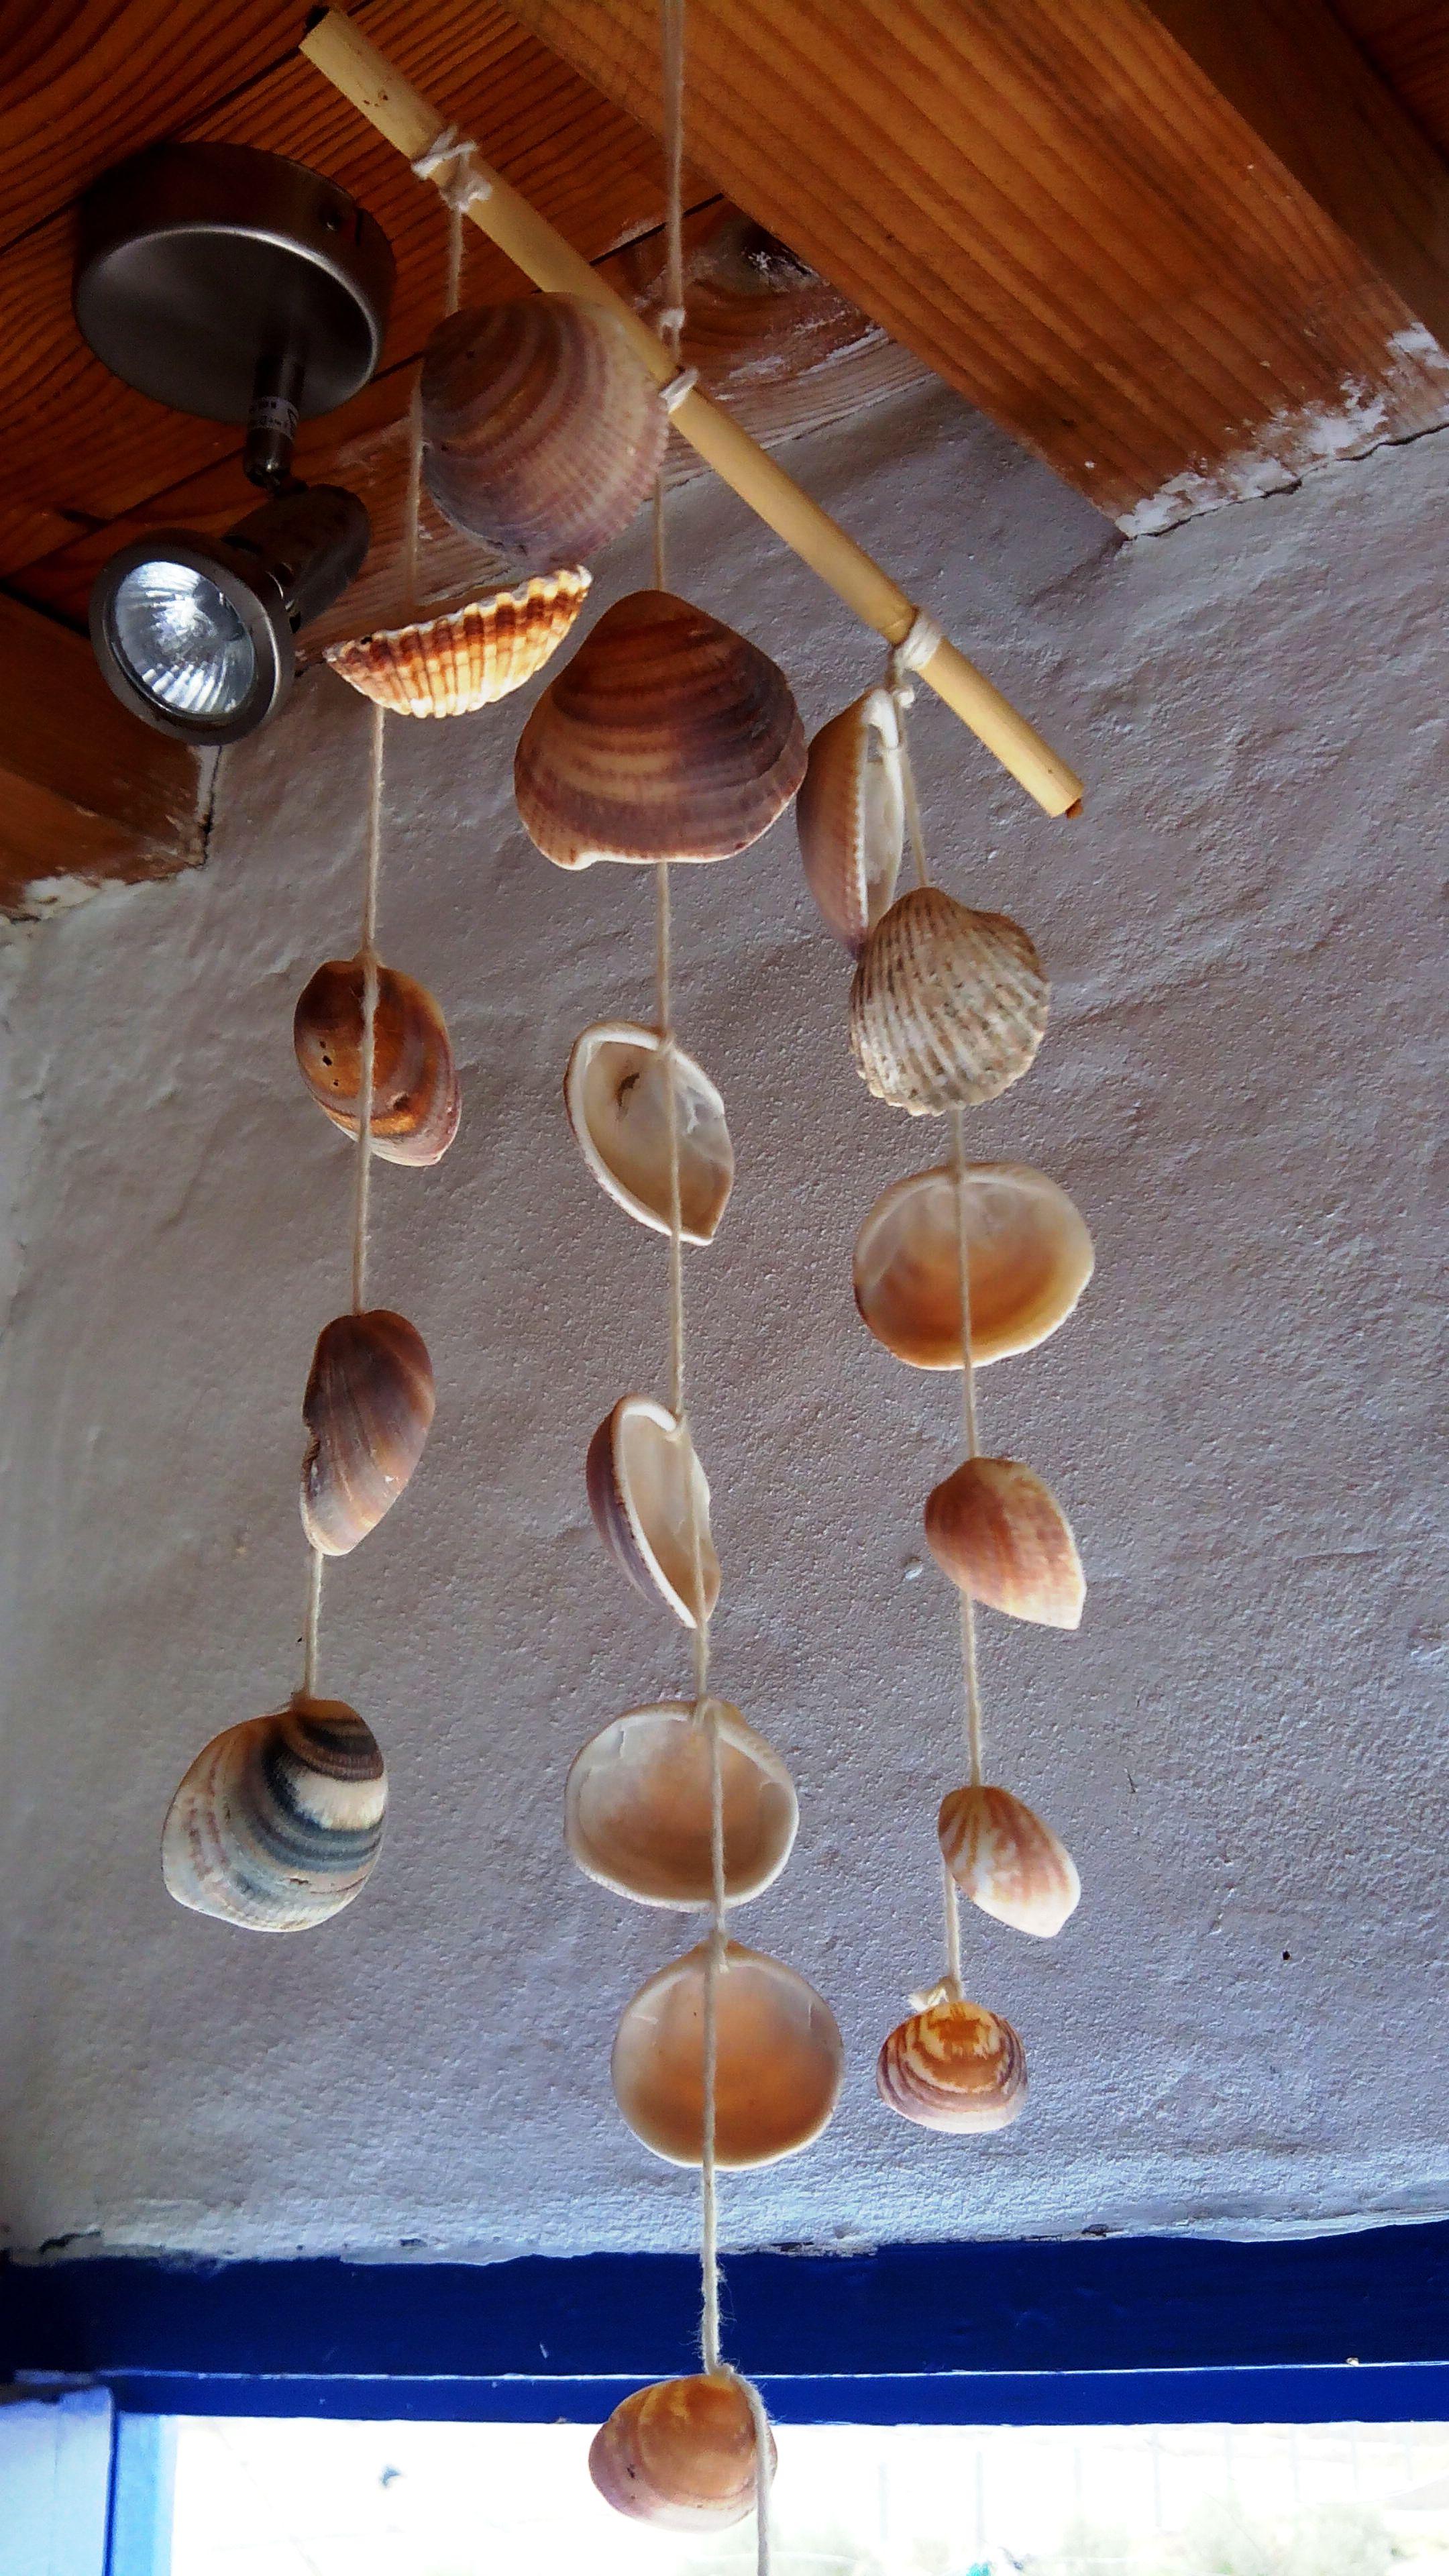 movil-conchas-handmade-casacueva-adoraideas